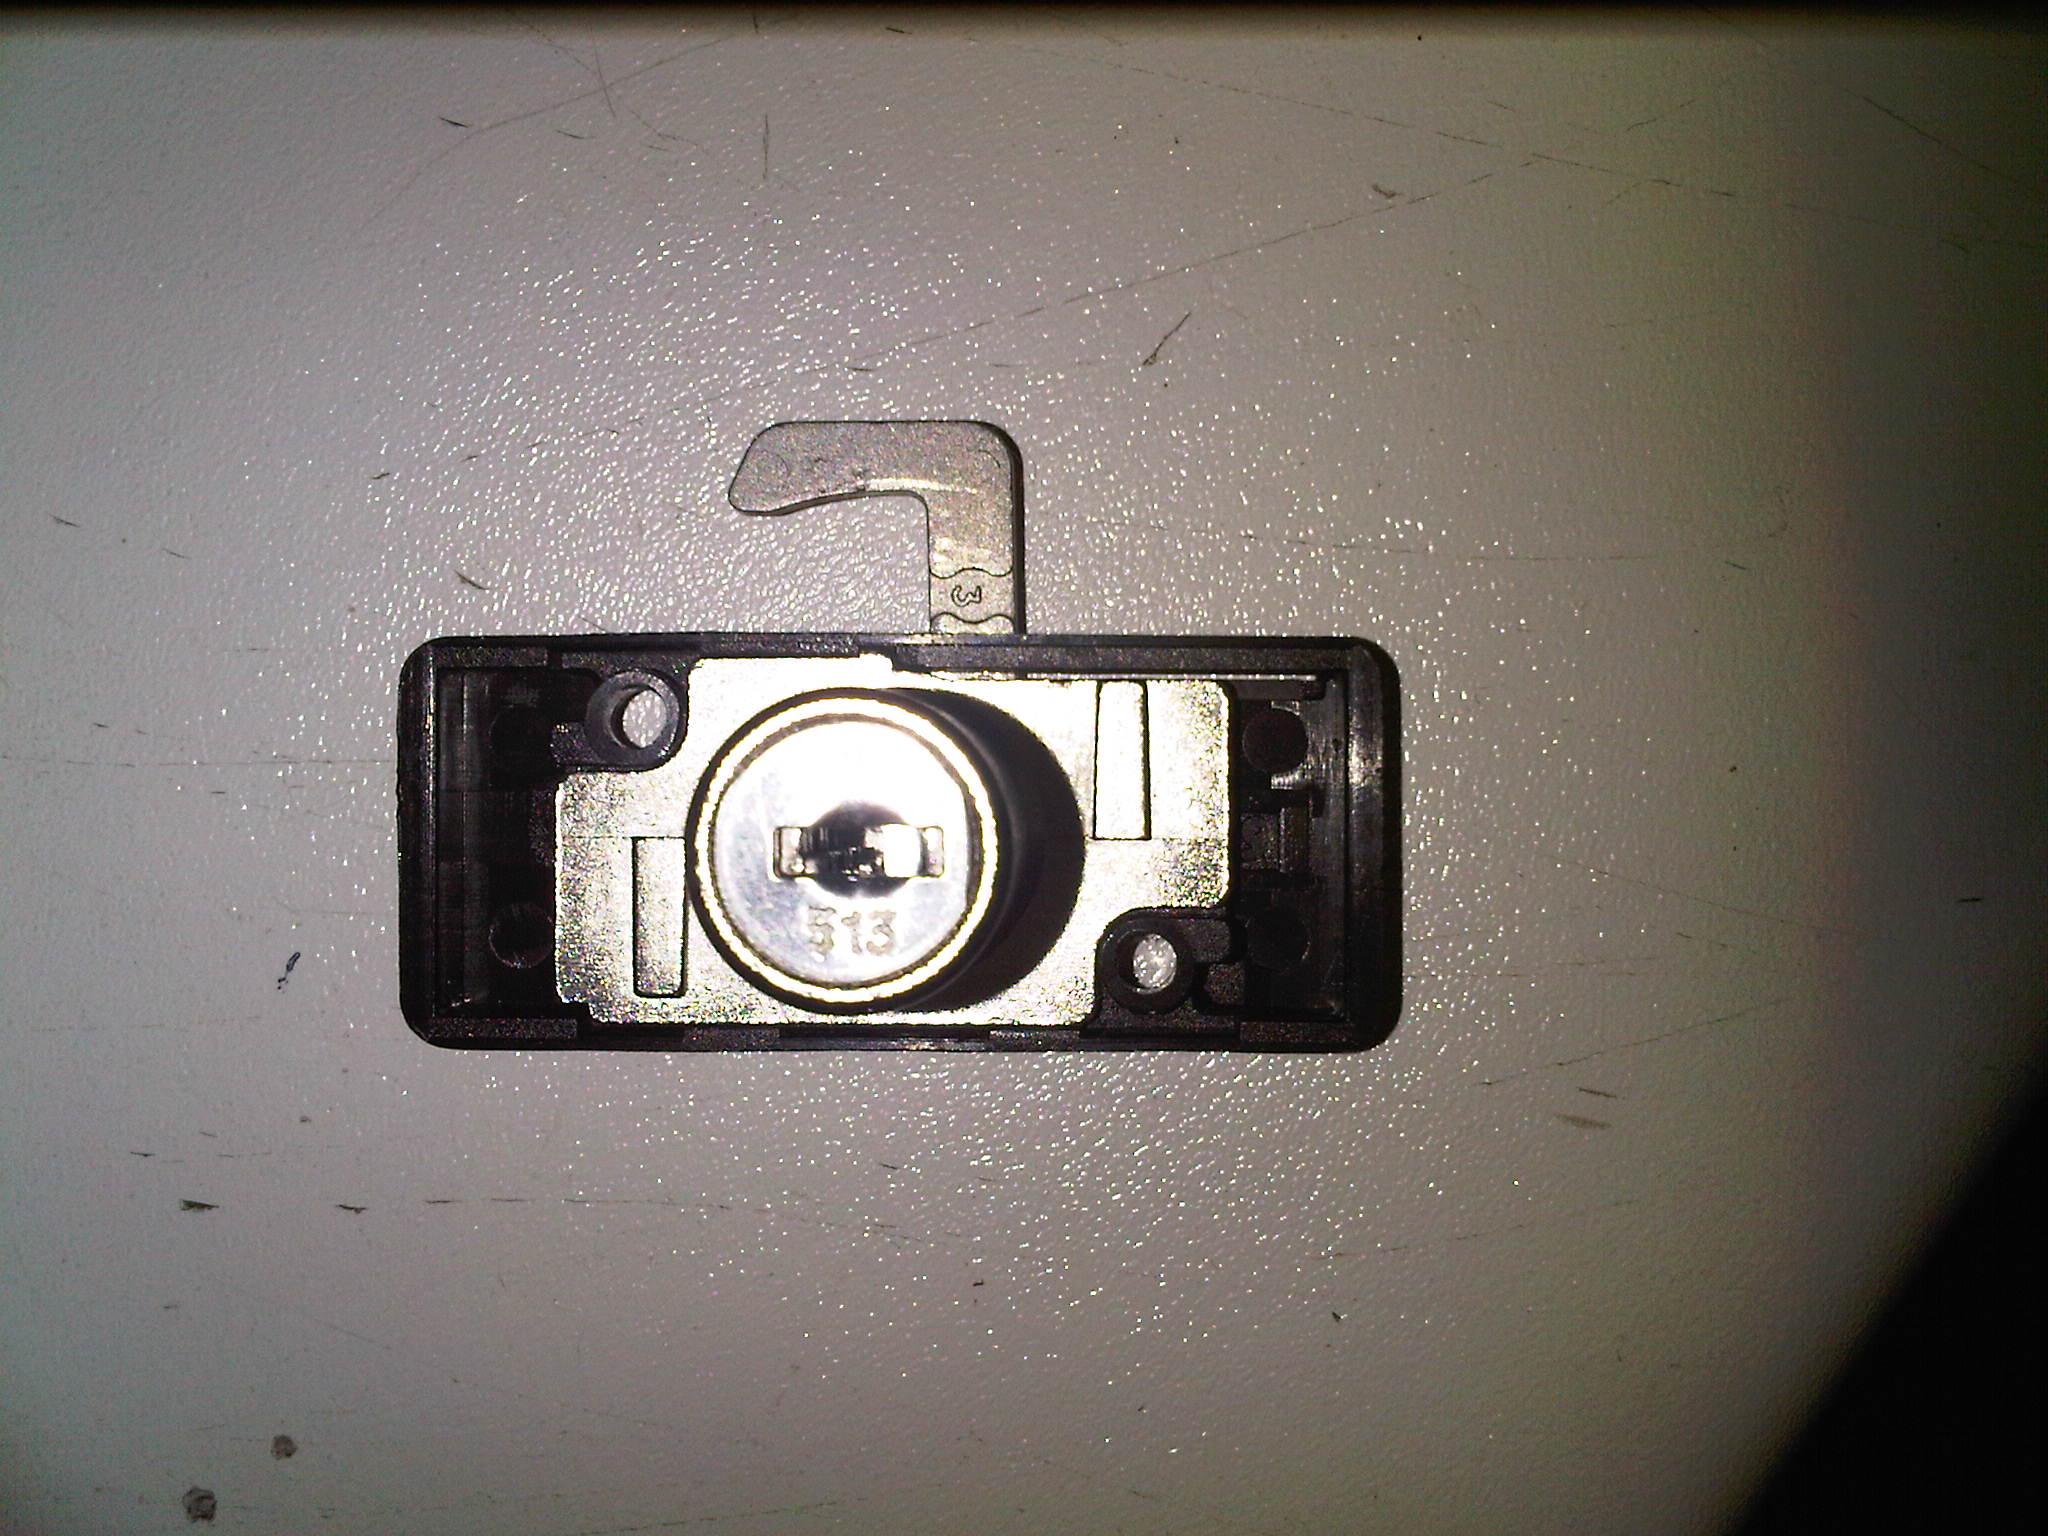 Keysplease Co Uk Ammerhurst Ltd Locksmith Uk